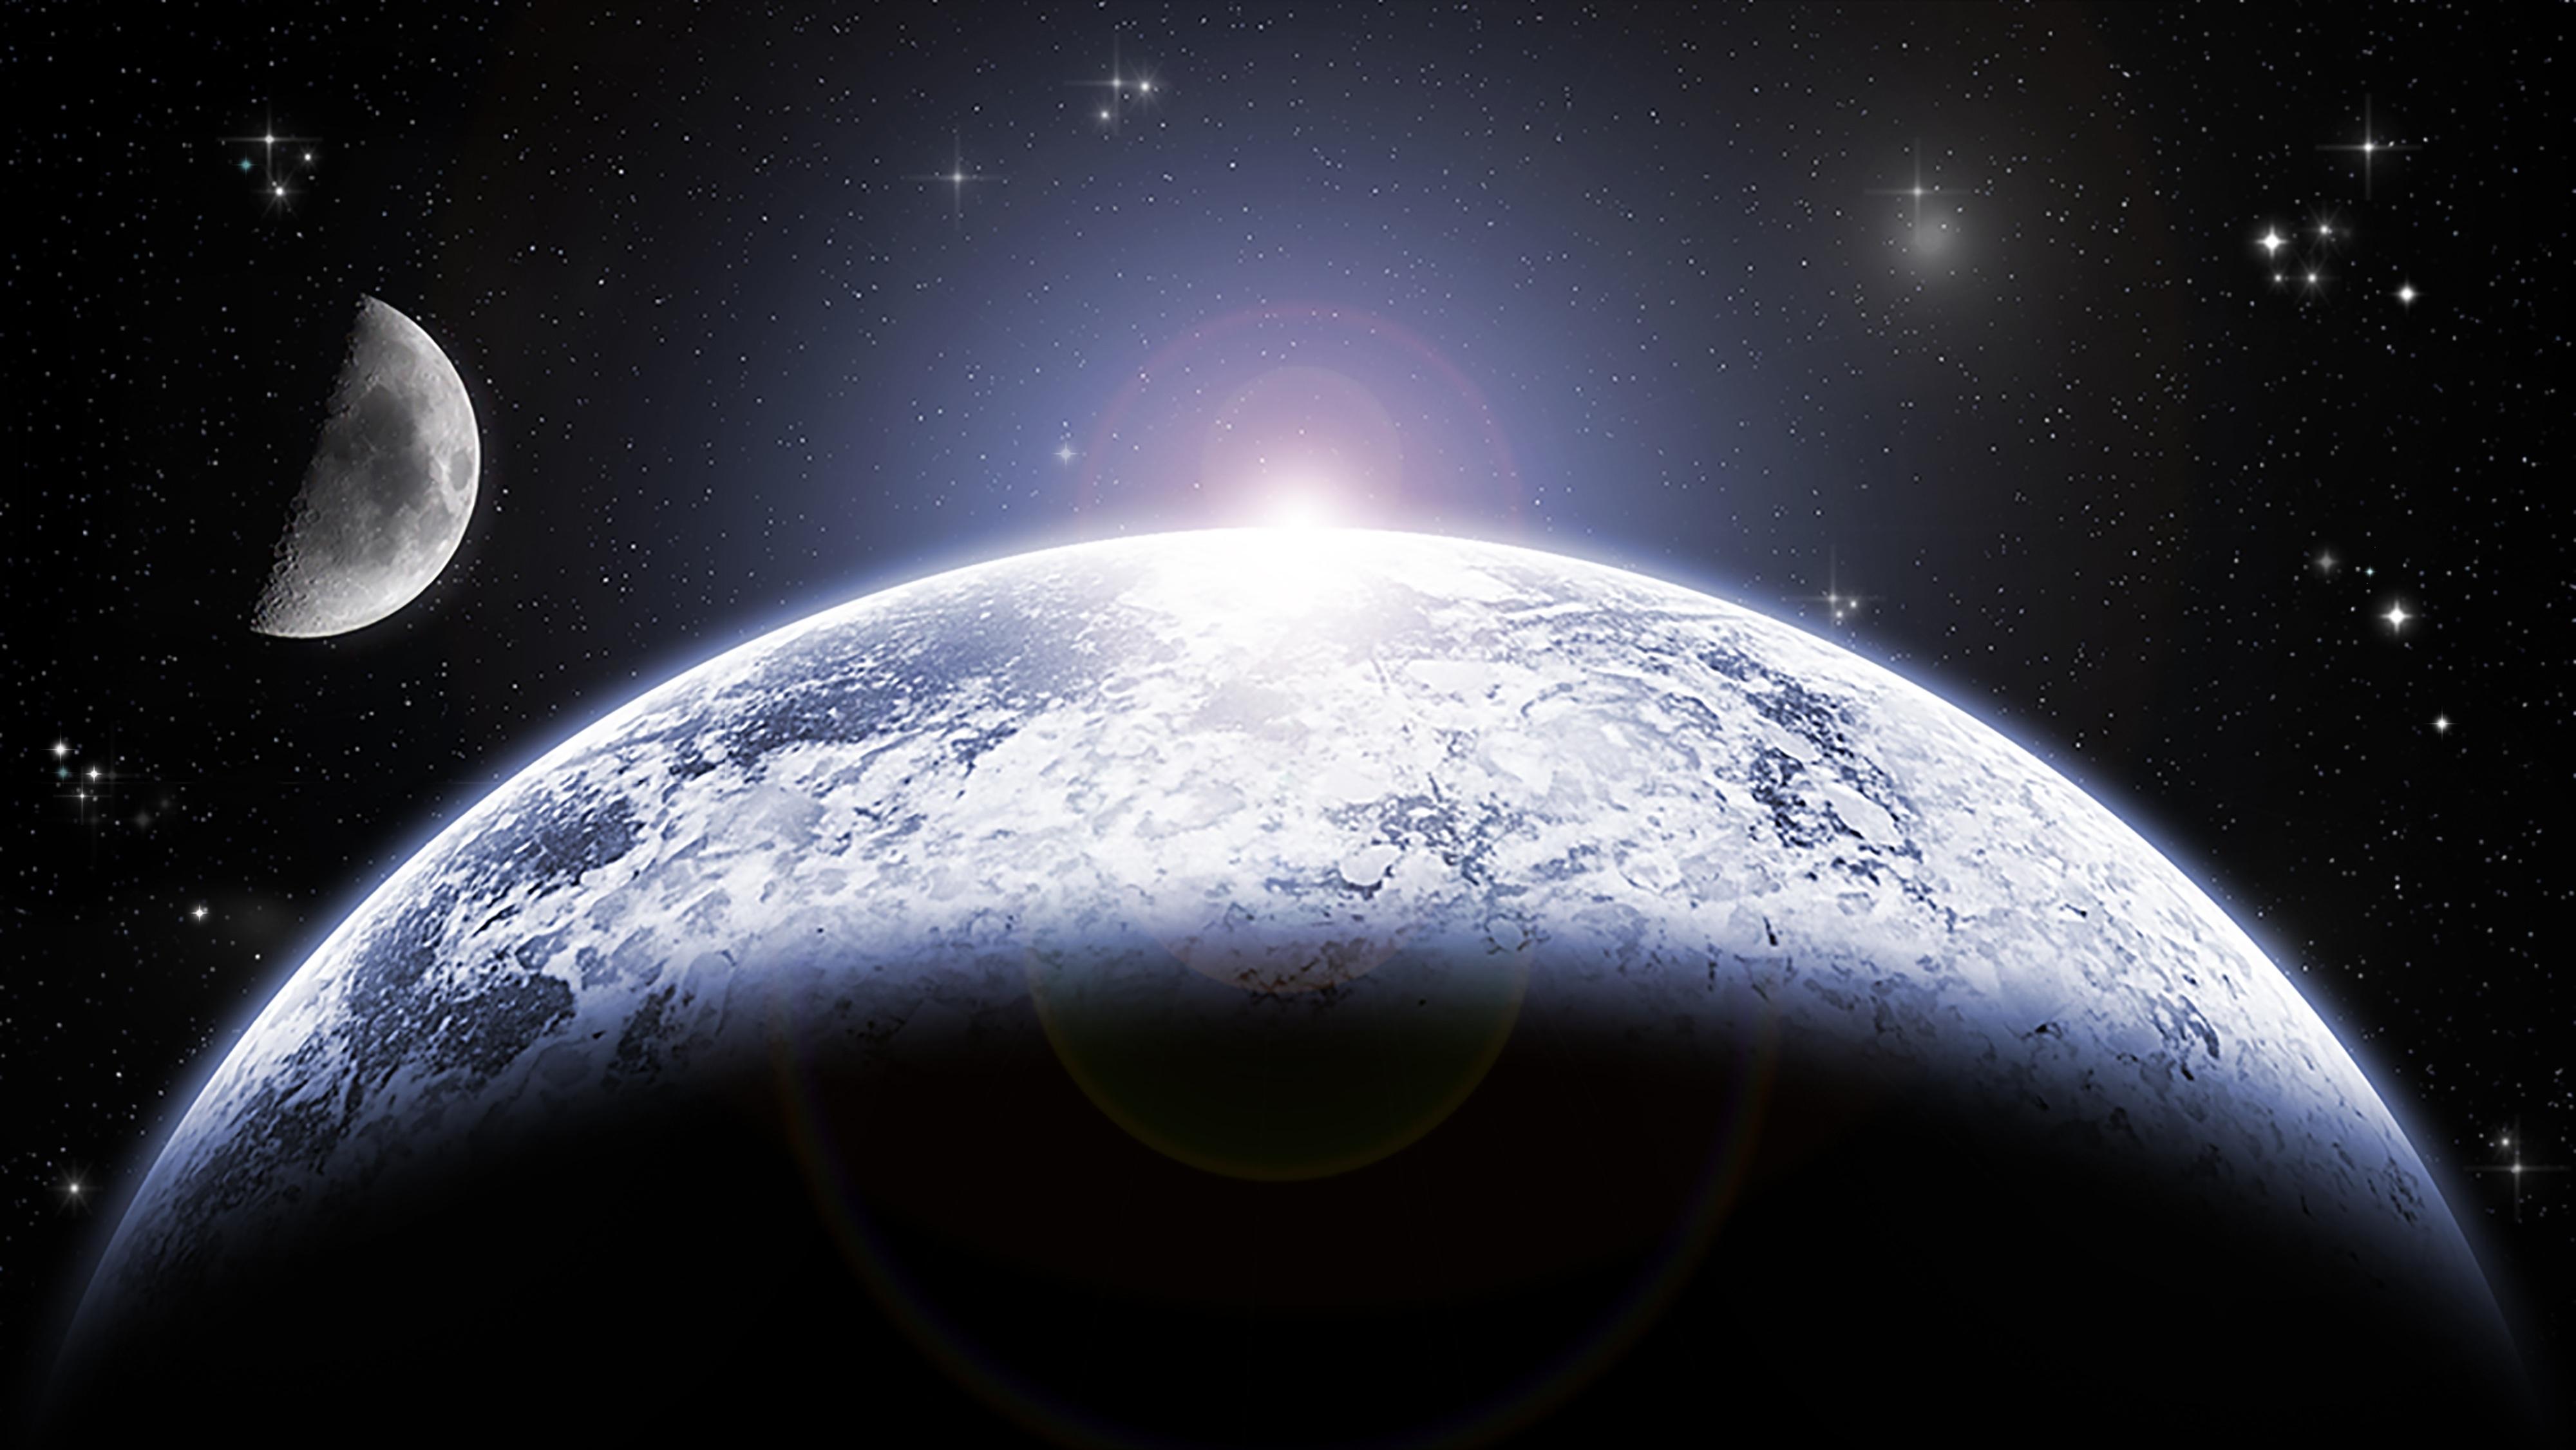 Gambar cahaya langit matahari bintang kosmos suasana gelap